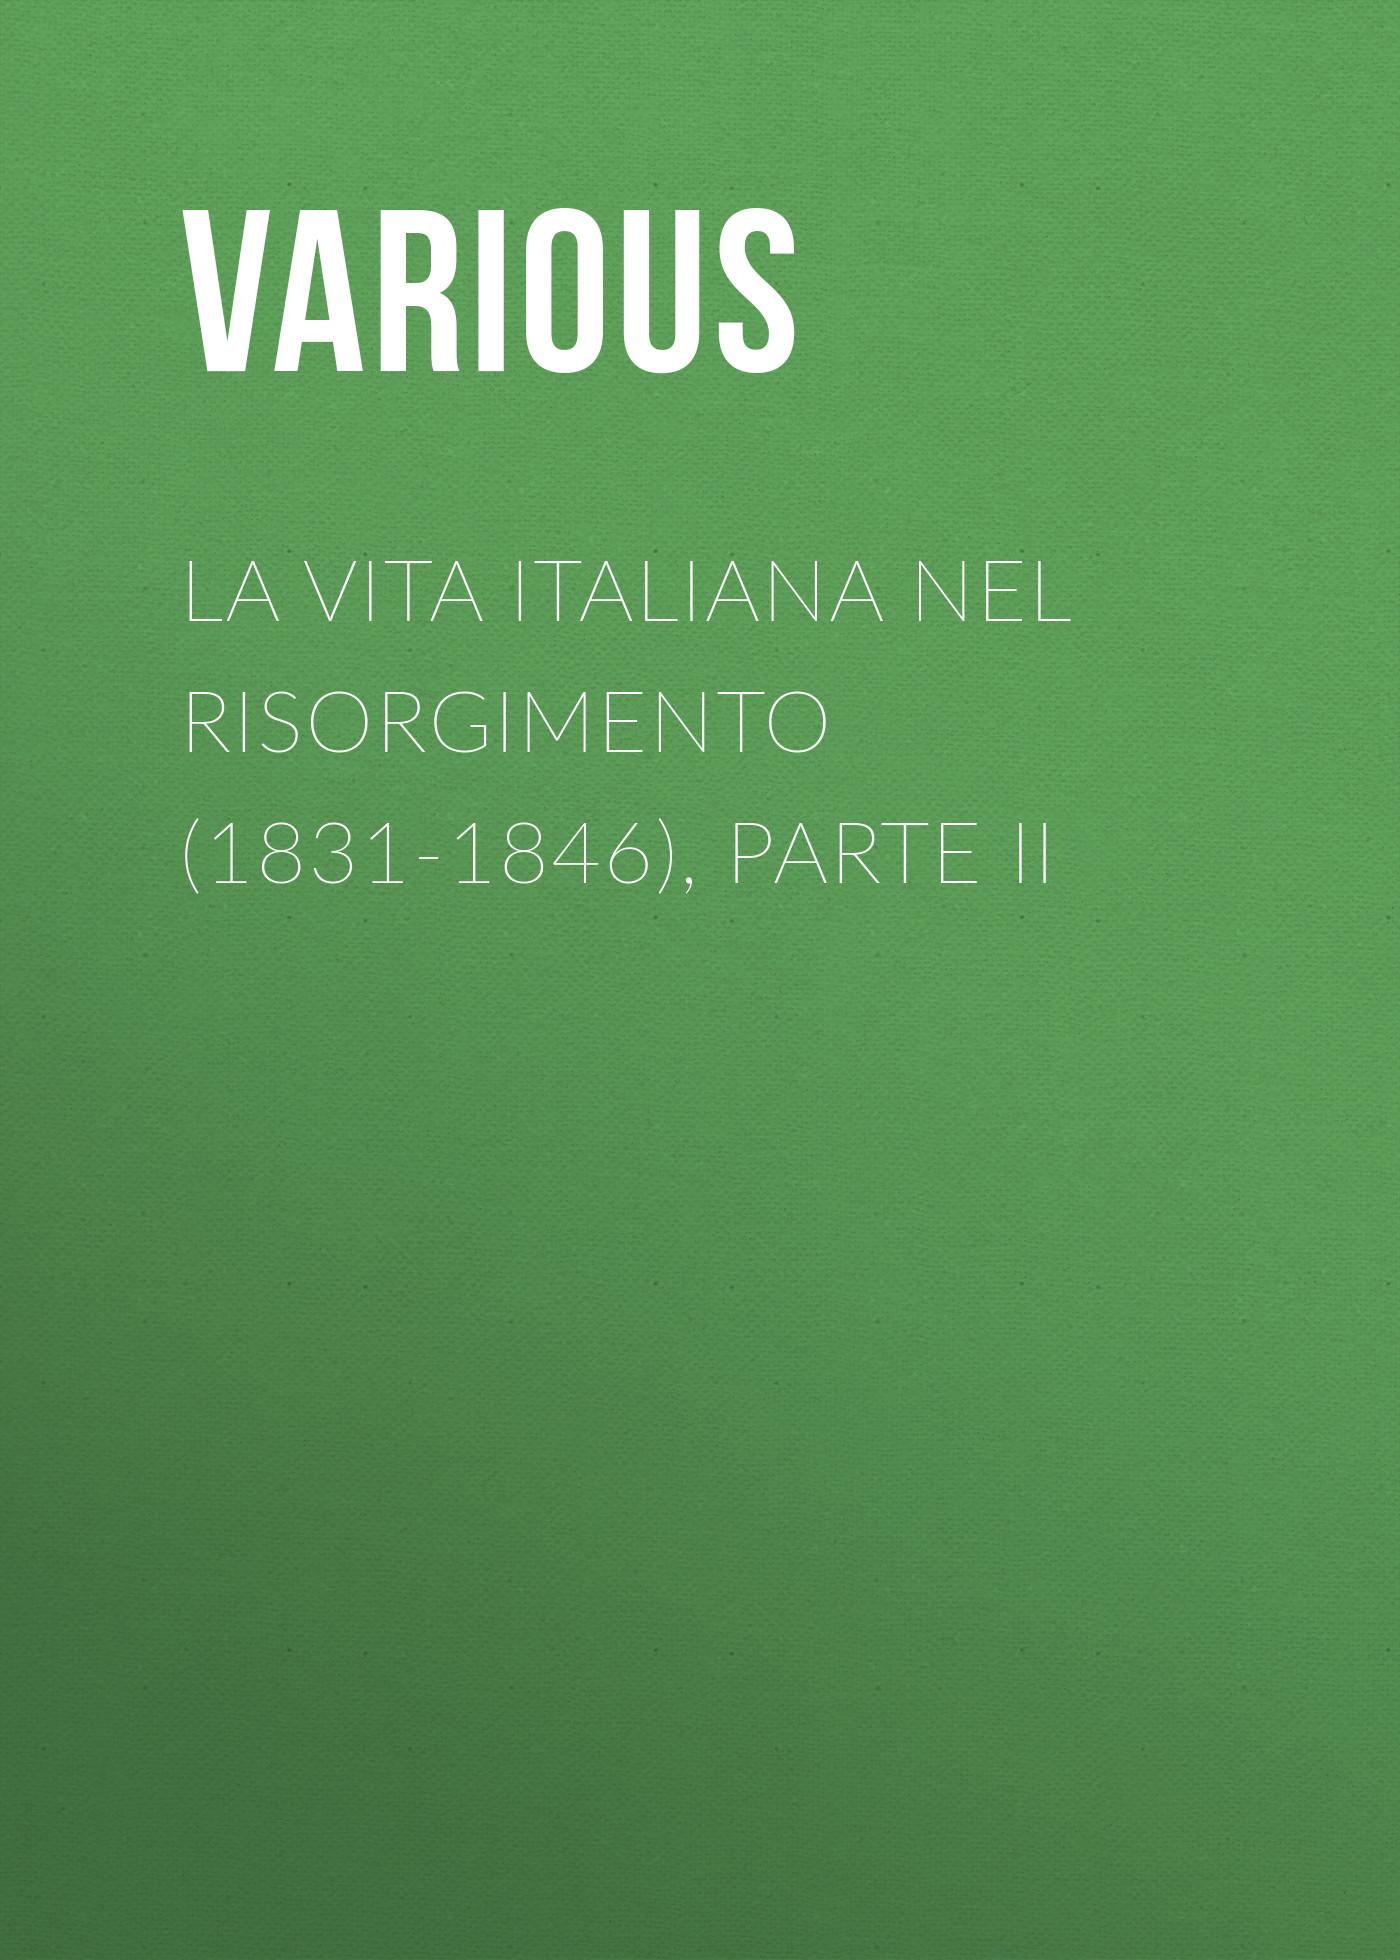 цены на Various La vita Italiana nel Risorgimento (1831-1846), parte II